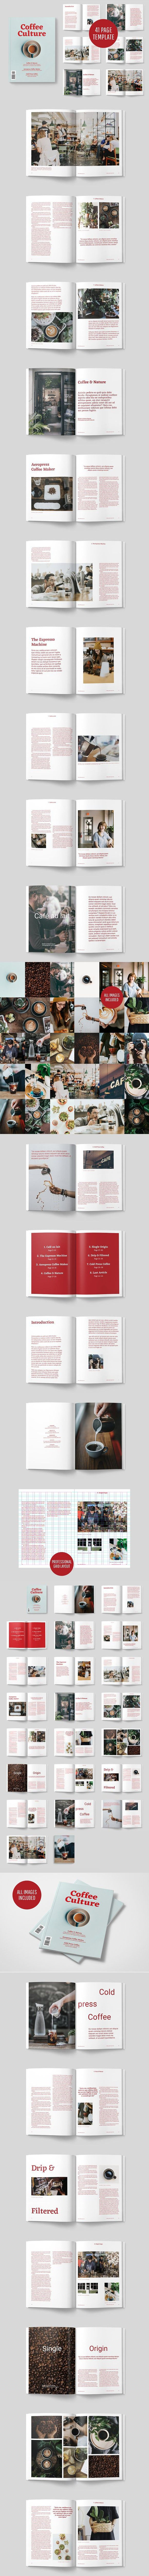 Coffee Culture Magazine